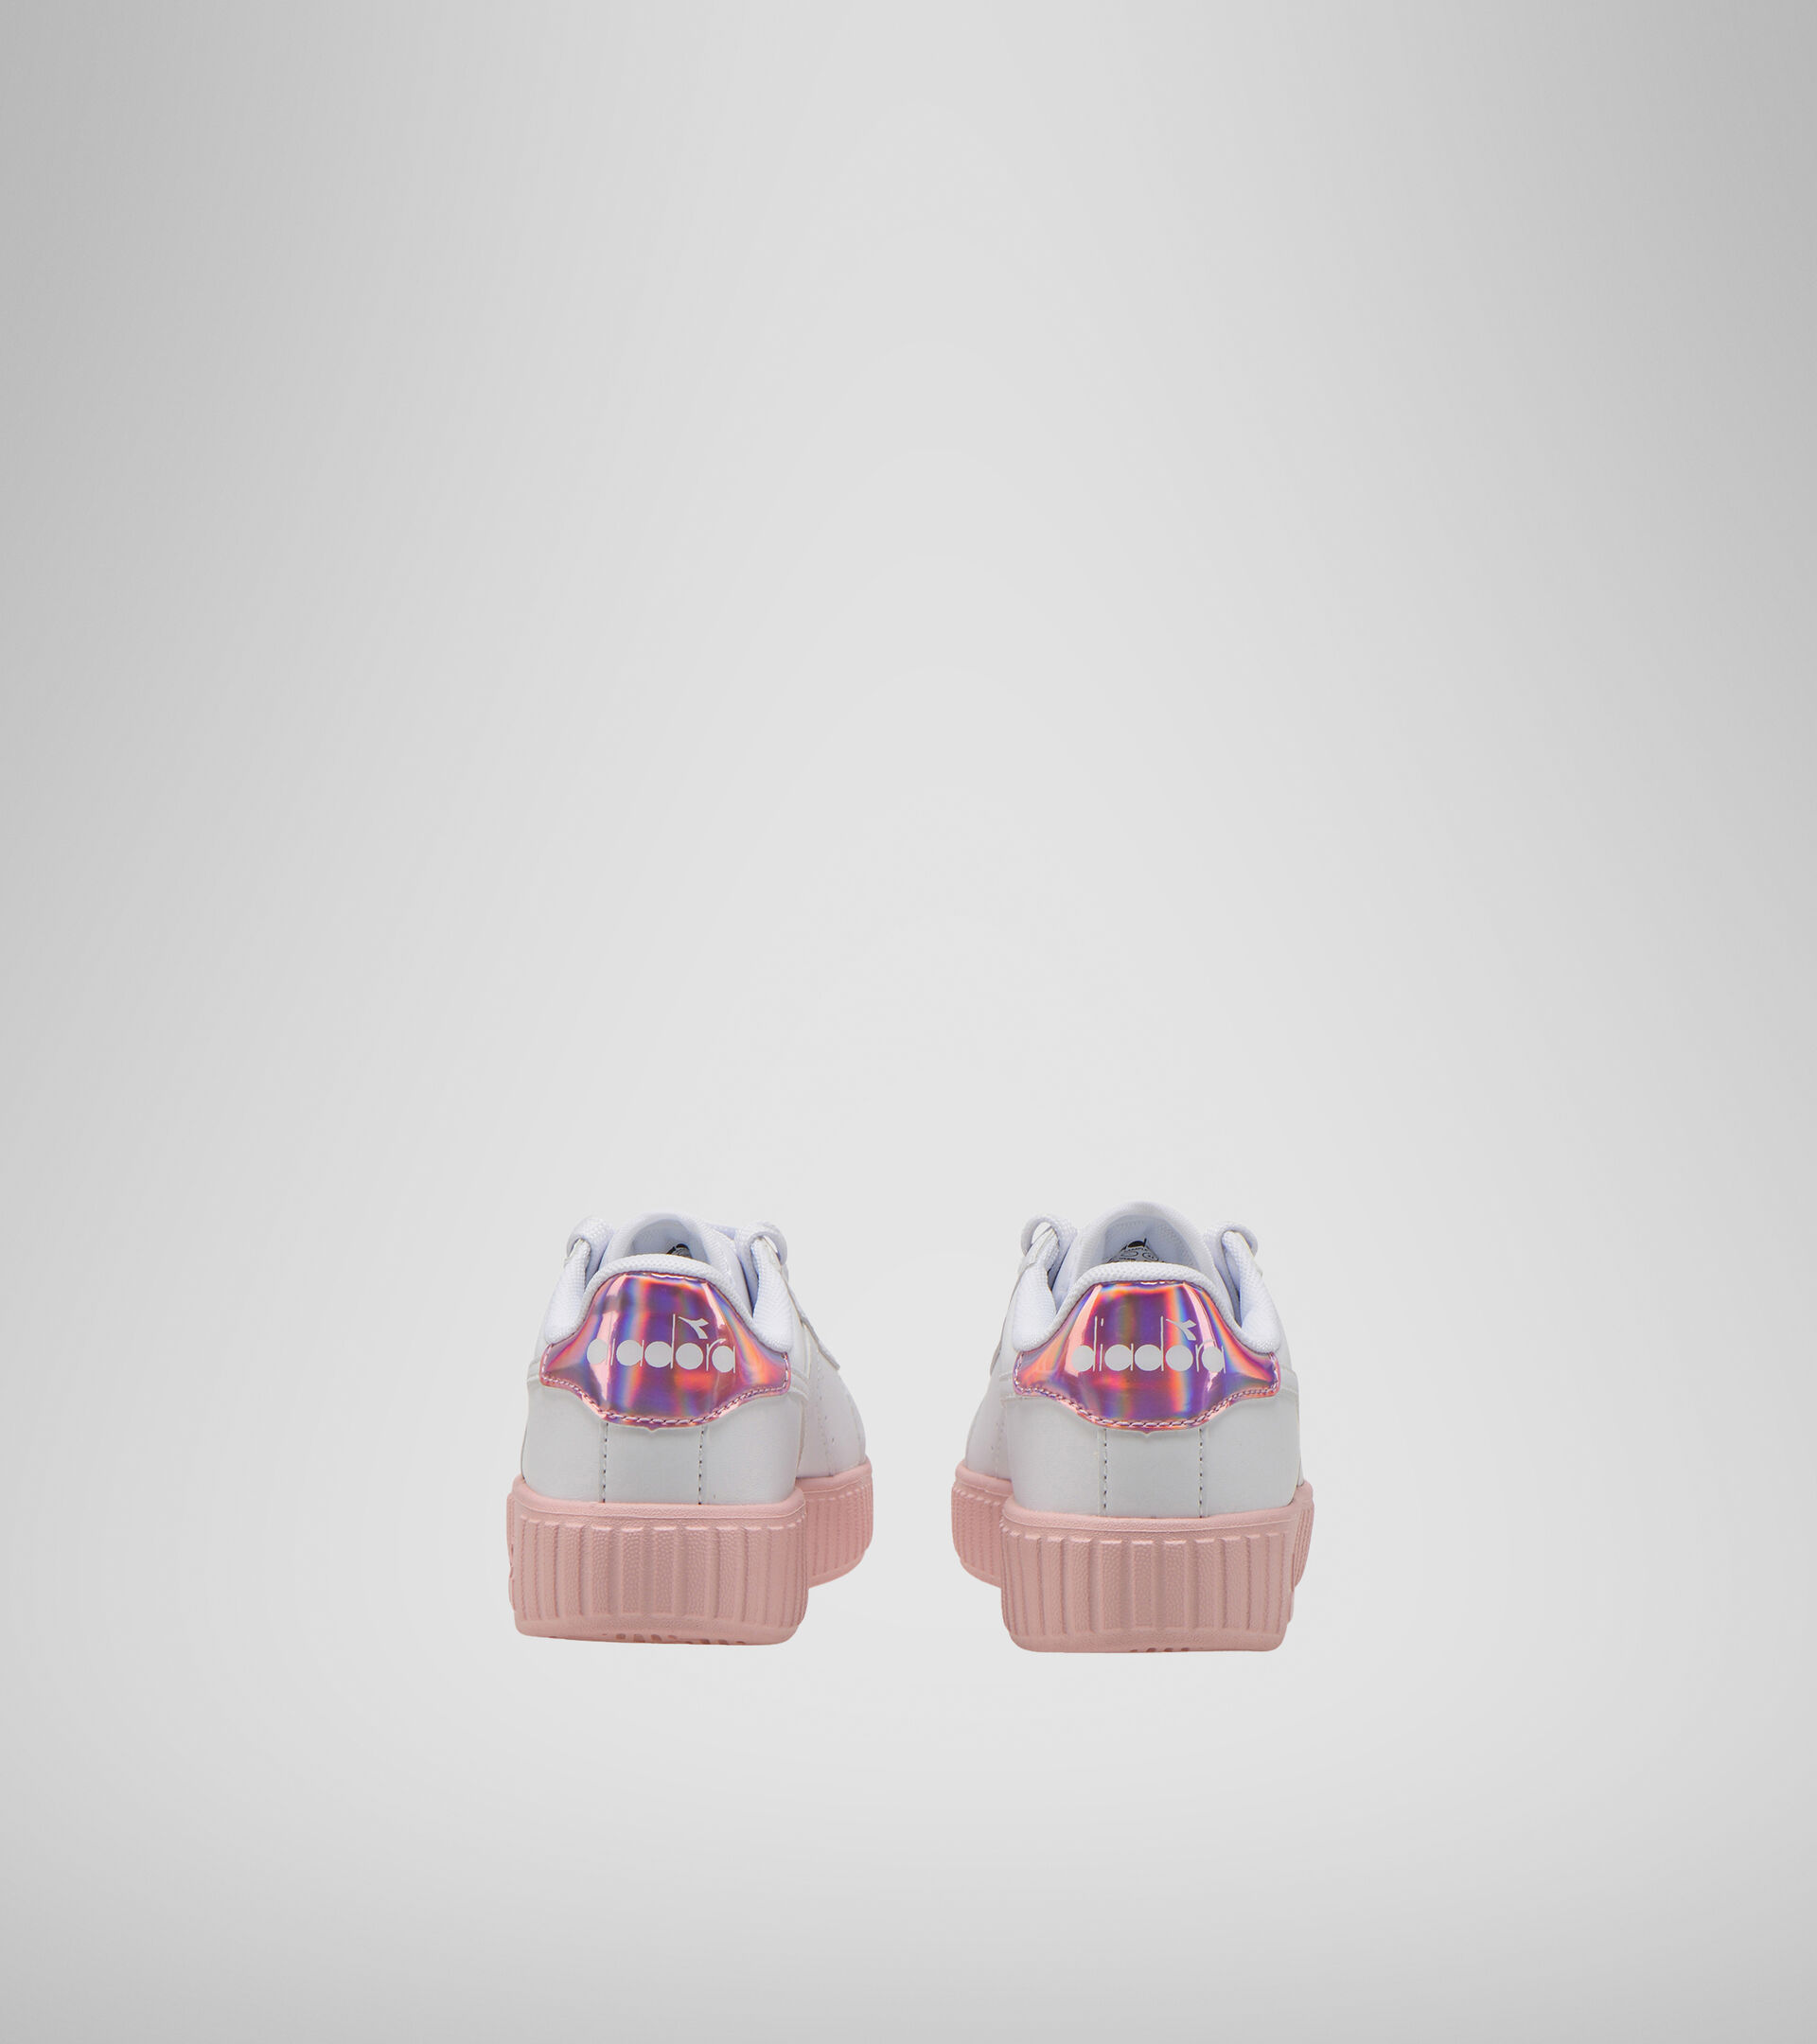 Chaussures de sport - Enfants 4-8 ans GAME STEP PS BIANCO/ROSA MANOPESCA - Diadora